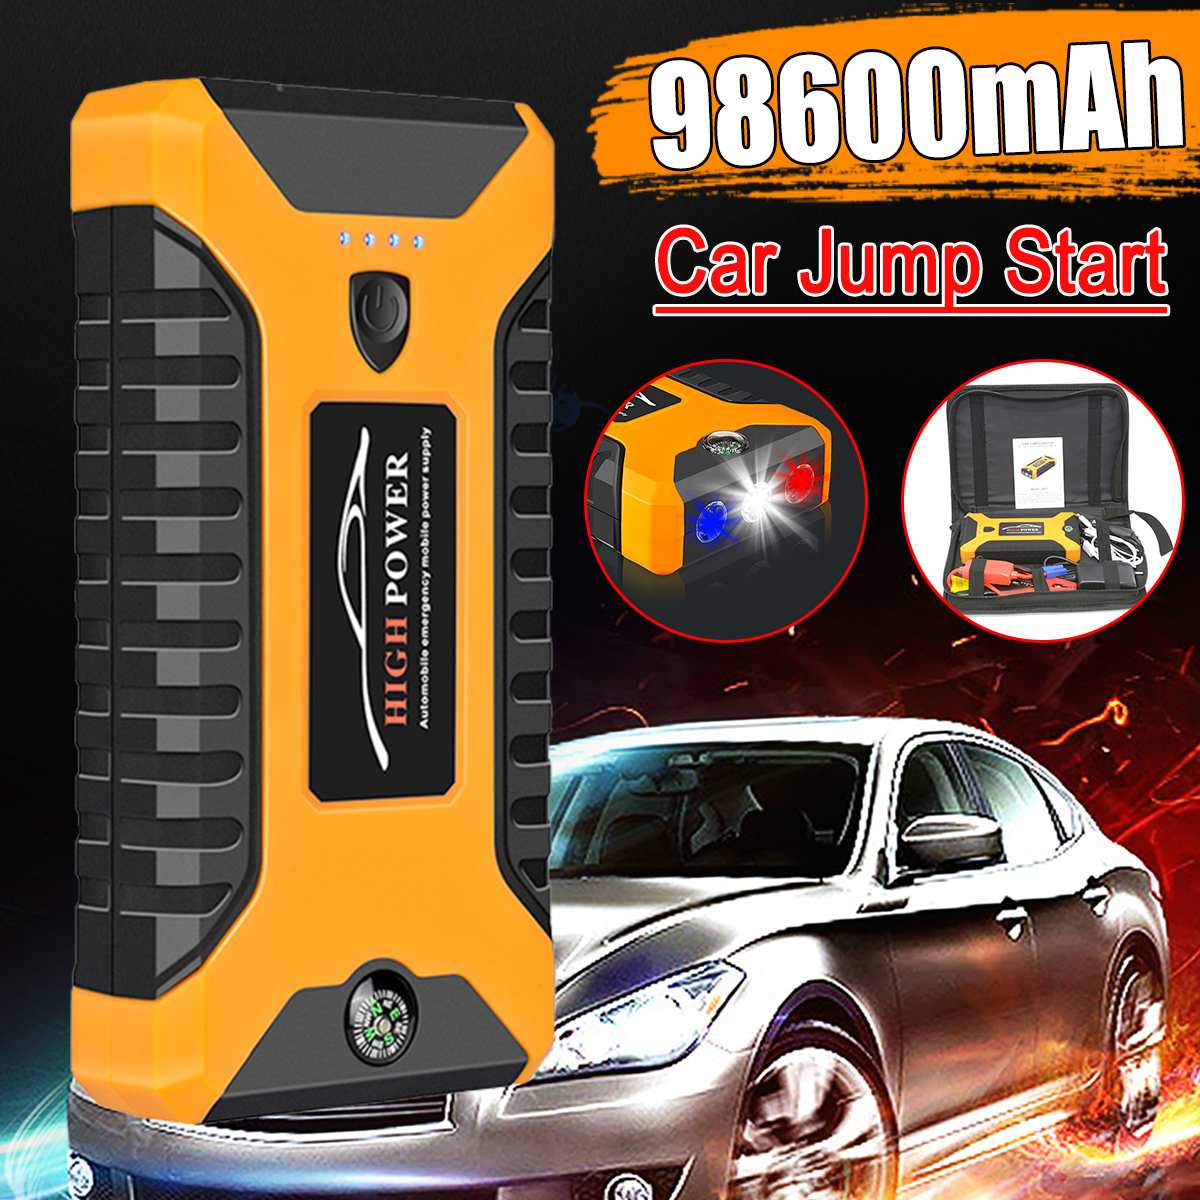 98600mAh de alta potencia de arranque de coche 12V dispositivo de arranque portátil cargador de batería de coche para coche Booster bumper 4 USB